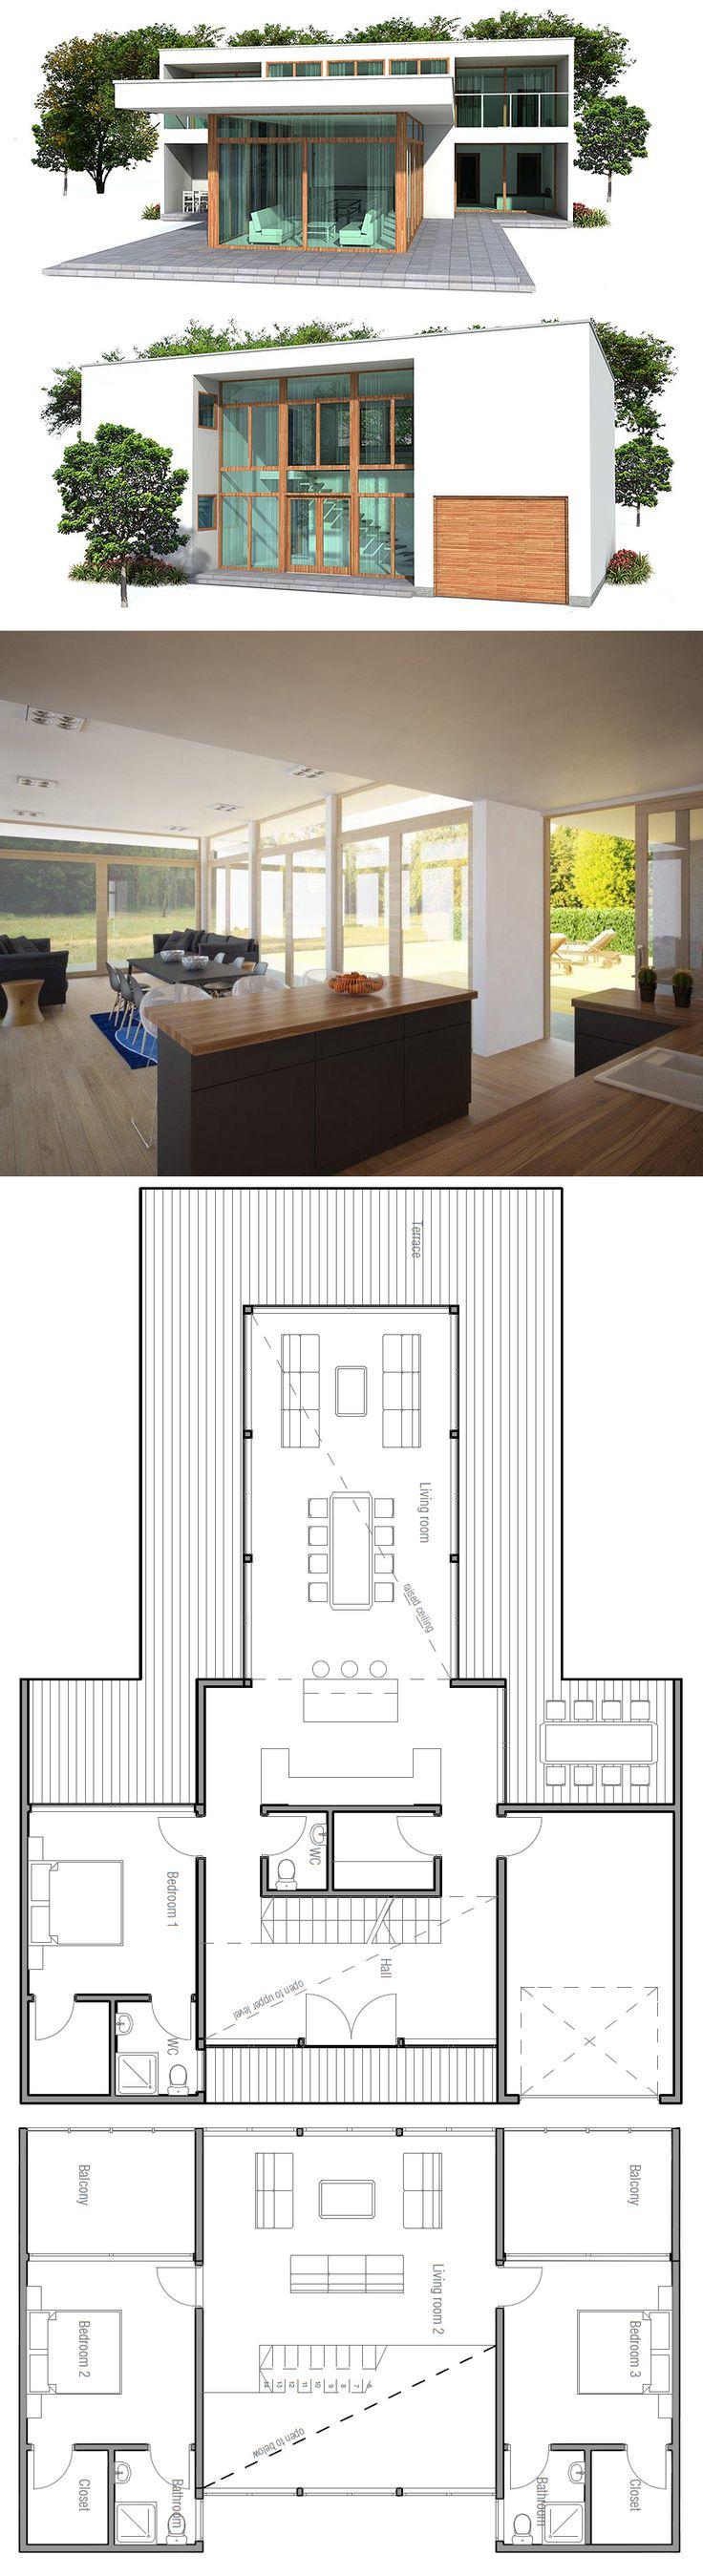 Minimalist House Plans Floor Plans best 25+ modern minimalist house ideas on pinterest | minimalist